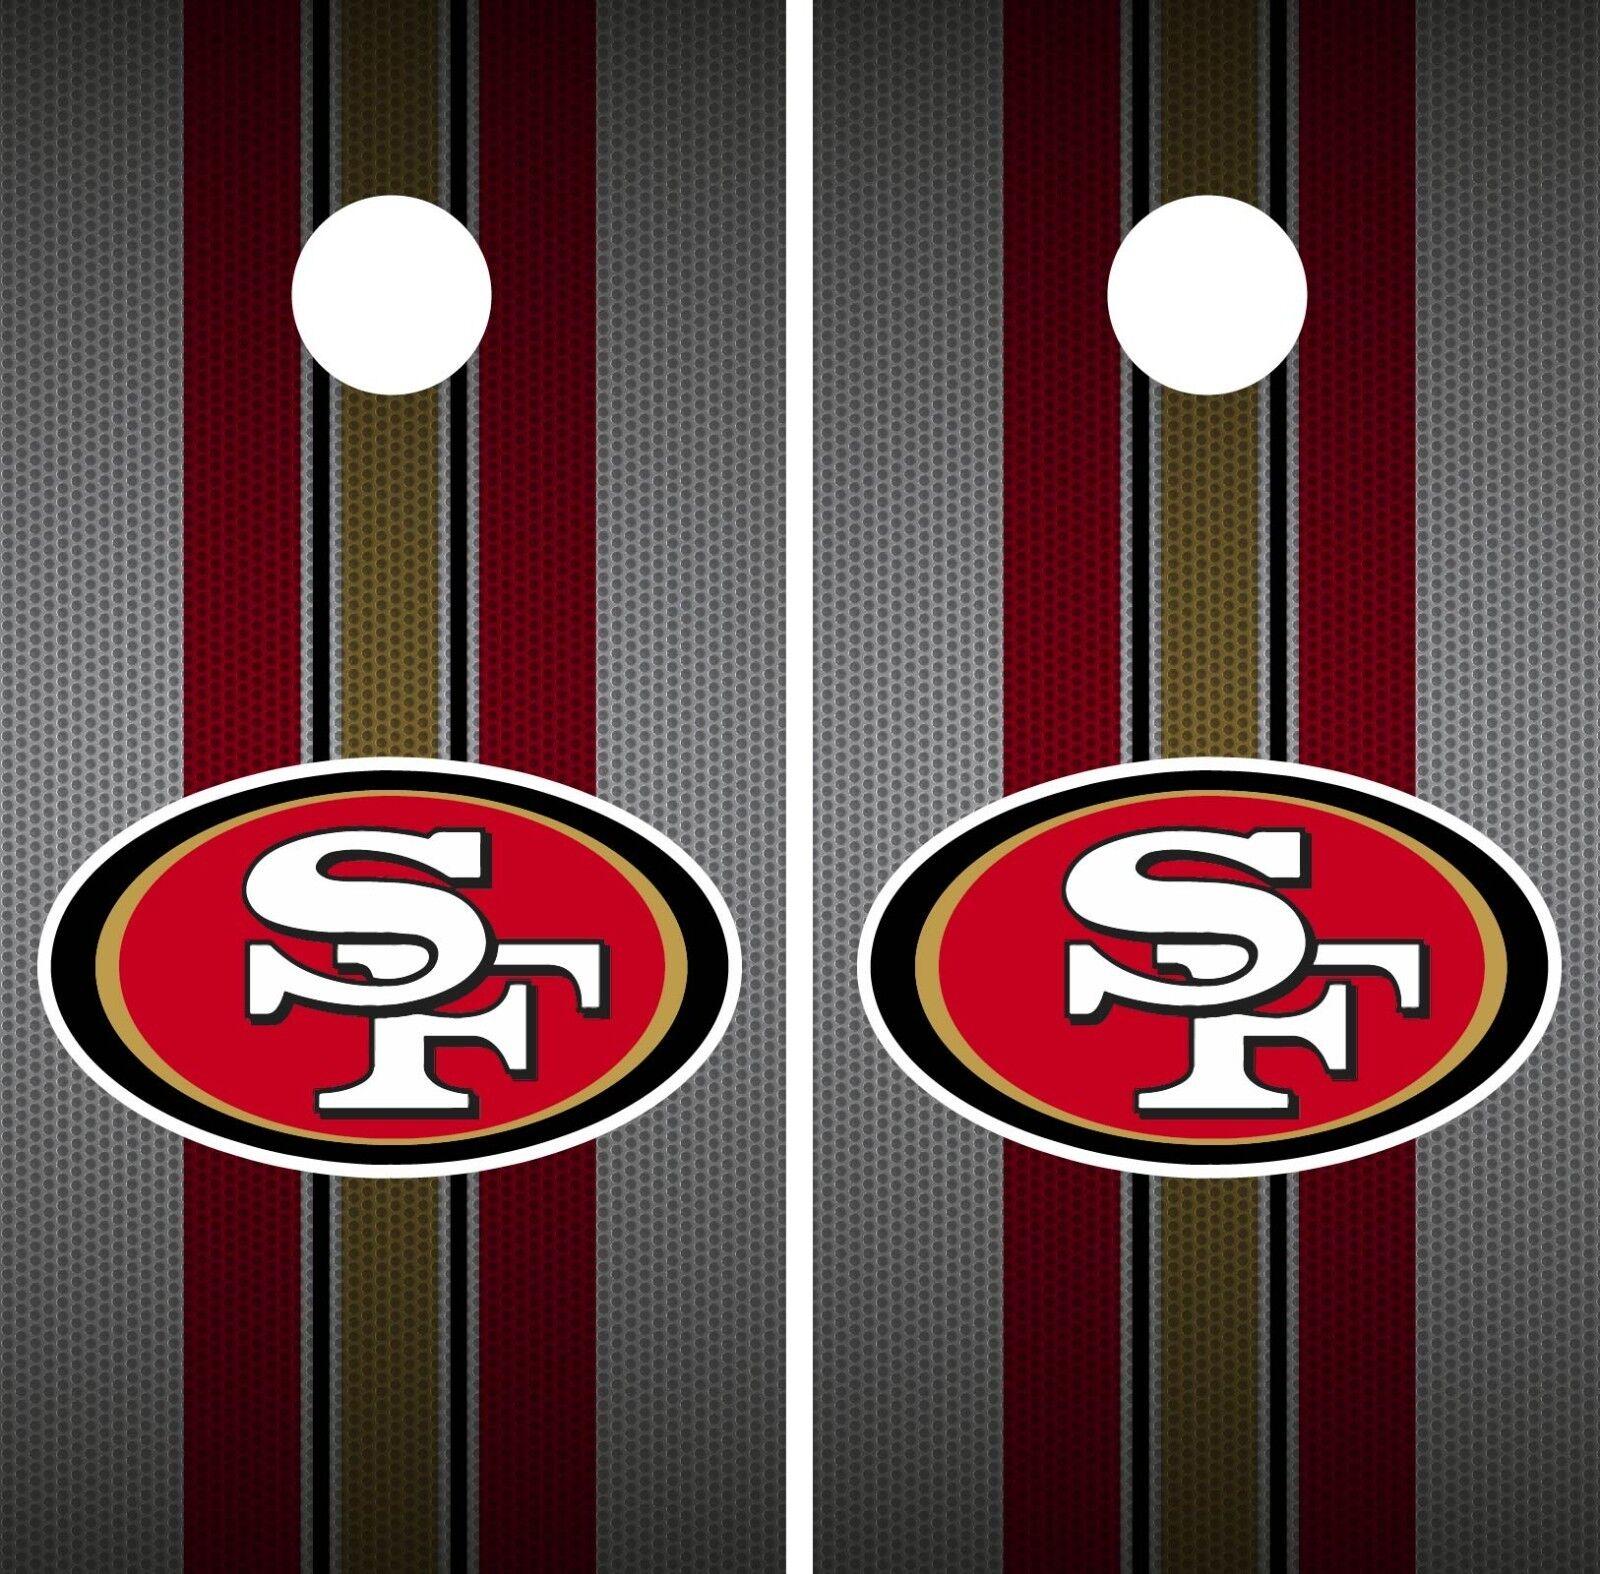 San Francisco 49ERS Cornhole Wrap NFL Team  Flag Game Skin Board Set Vinyl CO116  simple and generous design